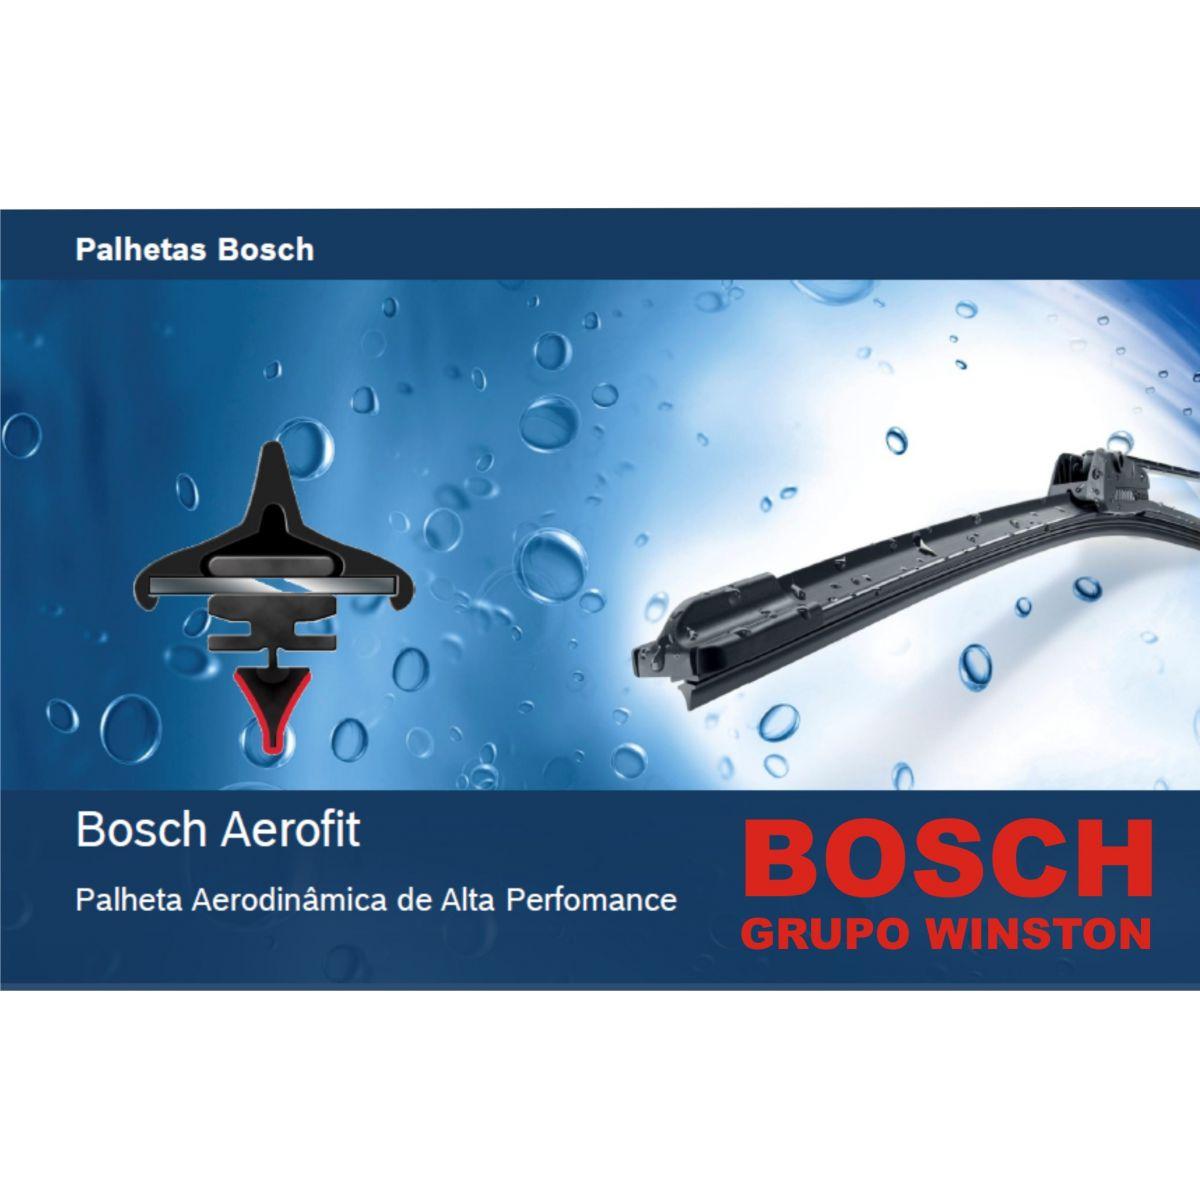 Palheta Bosch Aerofit Limpador de para brisa Bosch Corsa Hatch Sedan 2001 até 2012